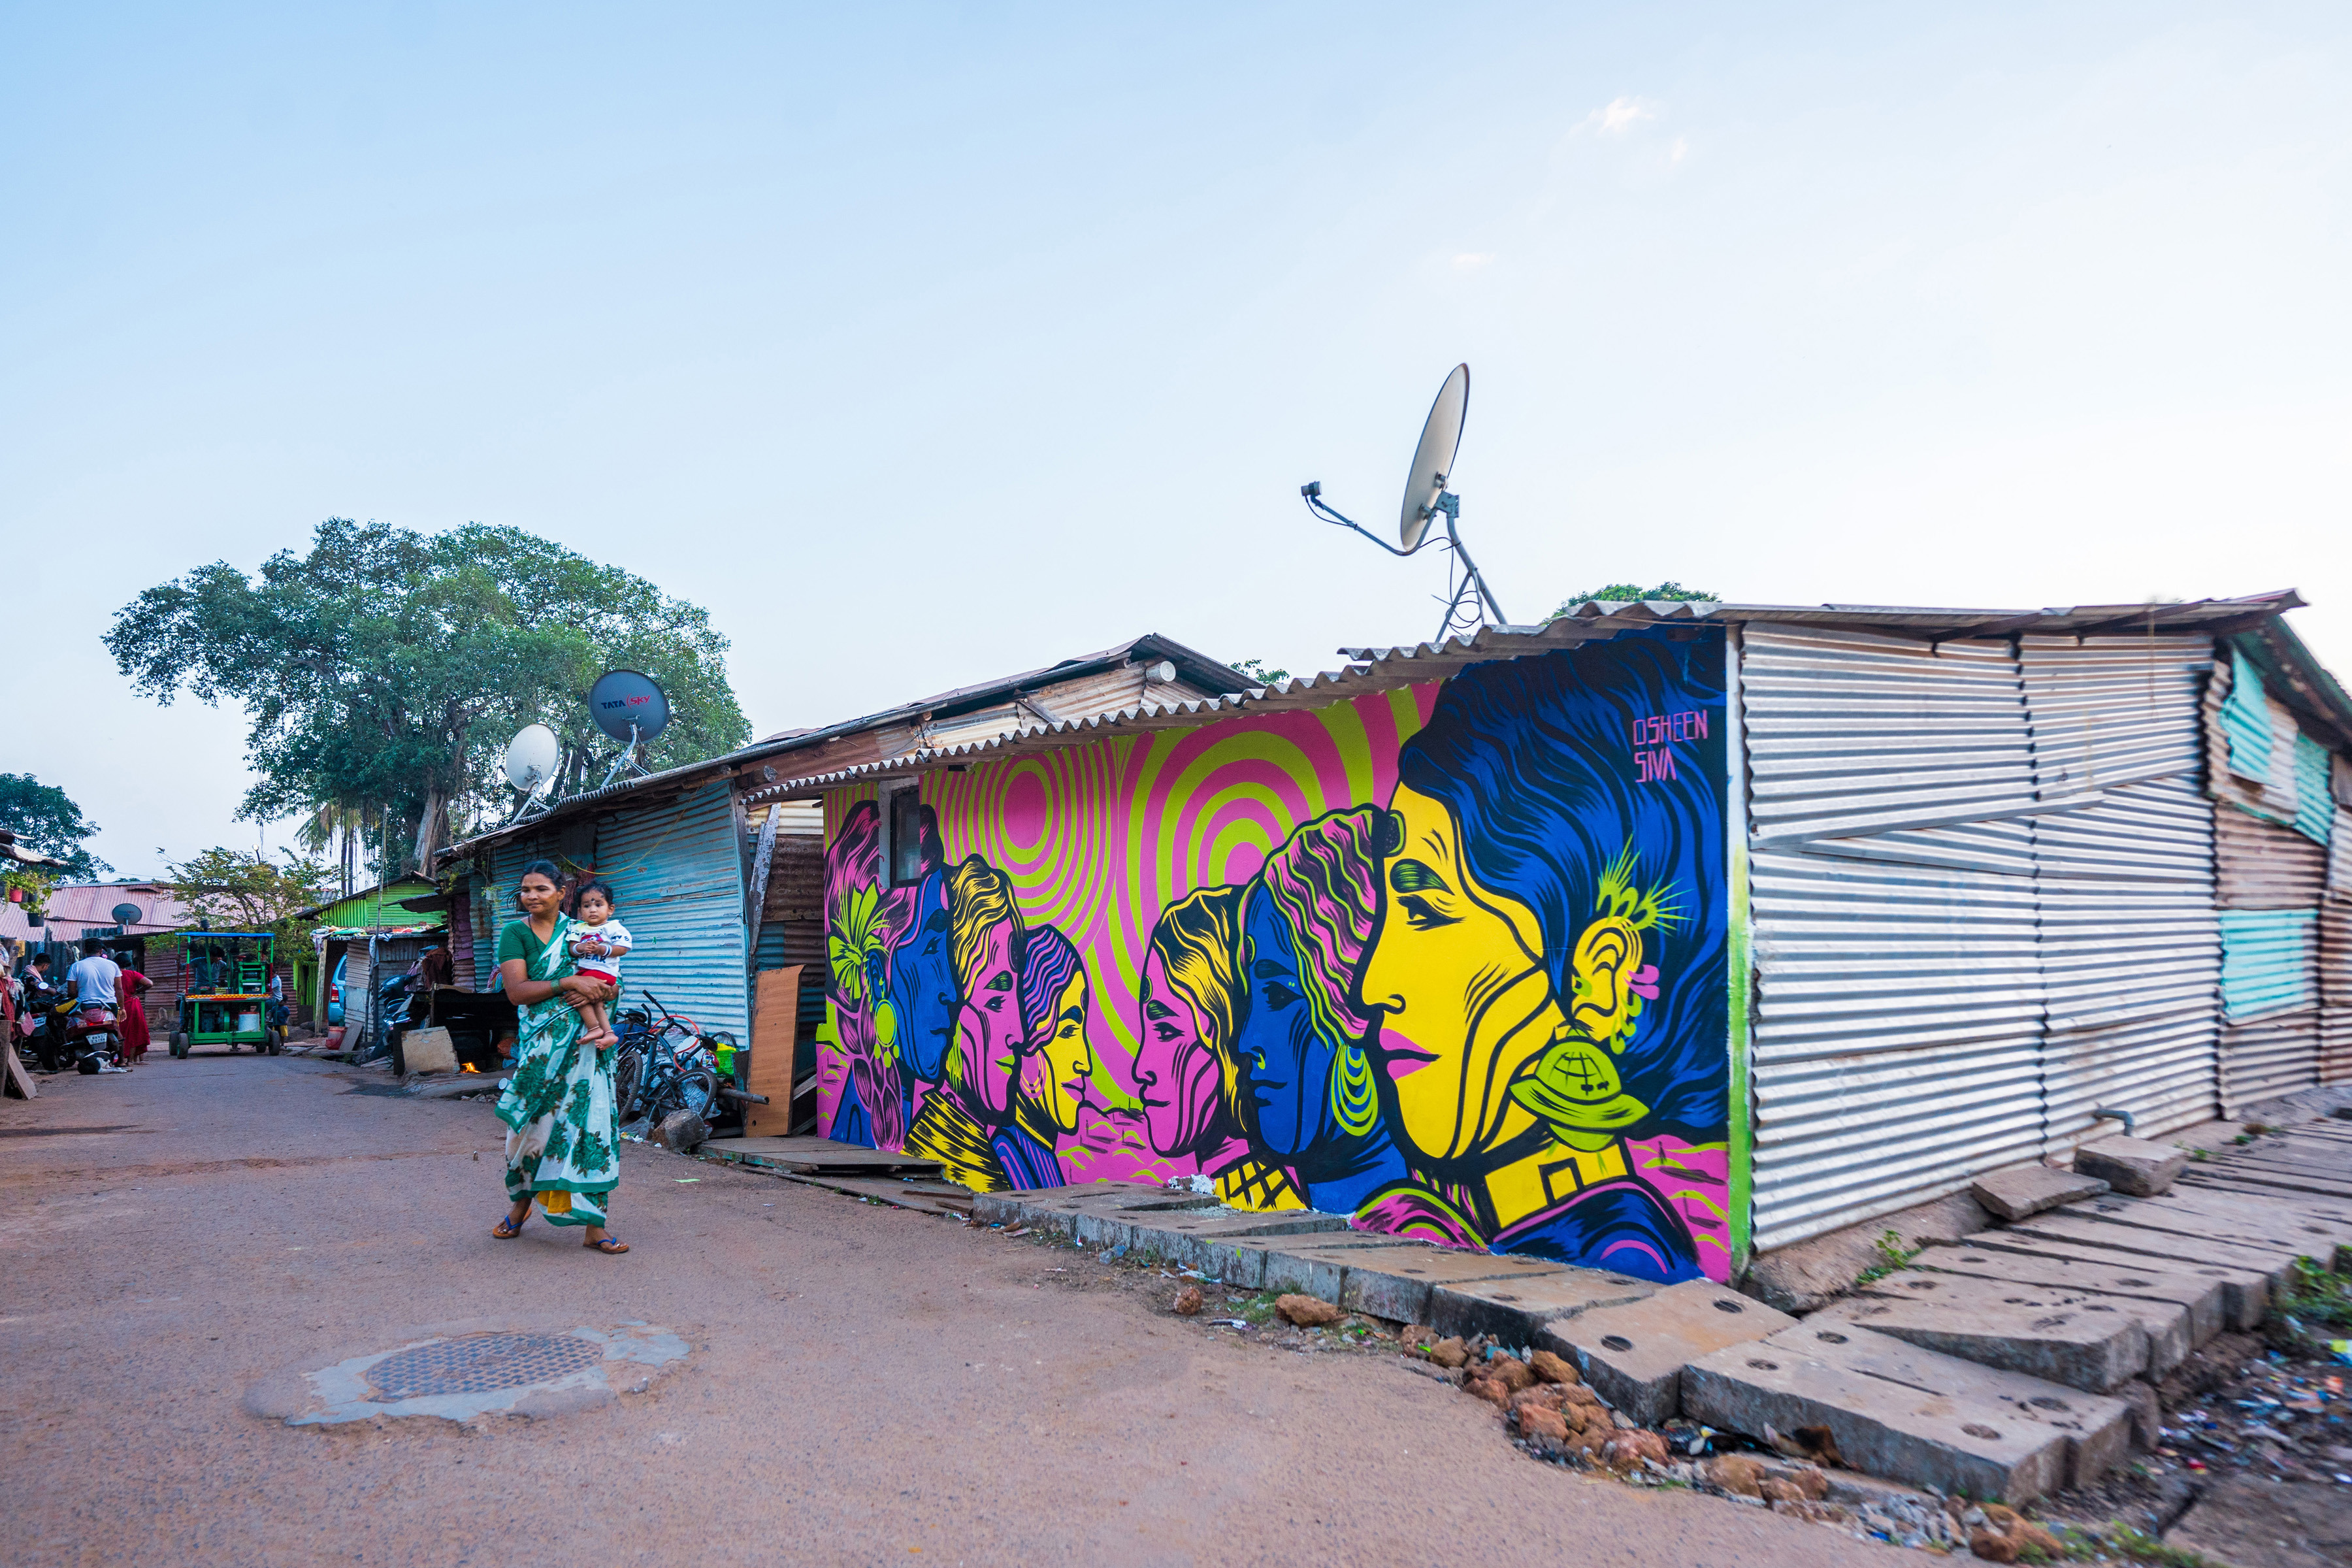 Osheen Wall 2 Reveals St Art Goa 2019 Pranav Gohil 10